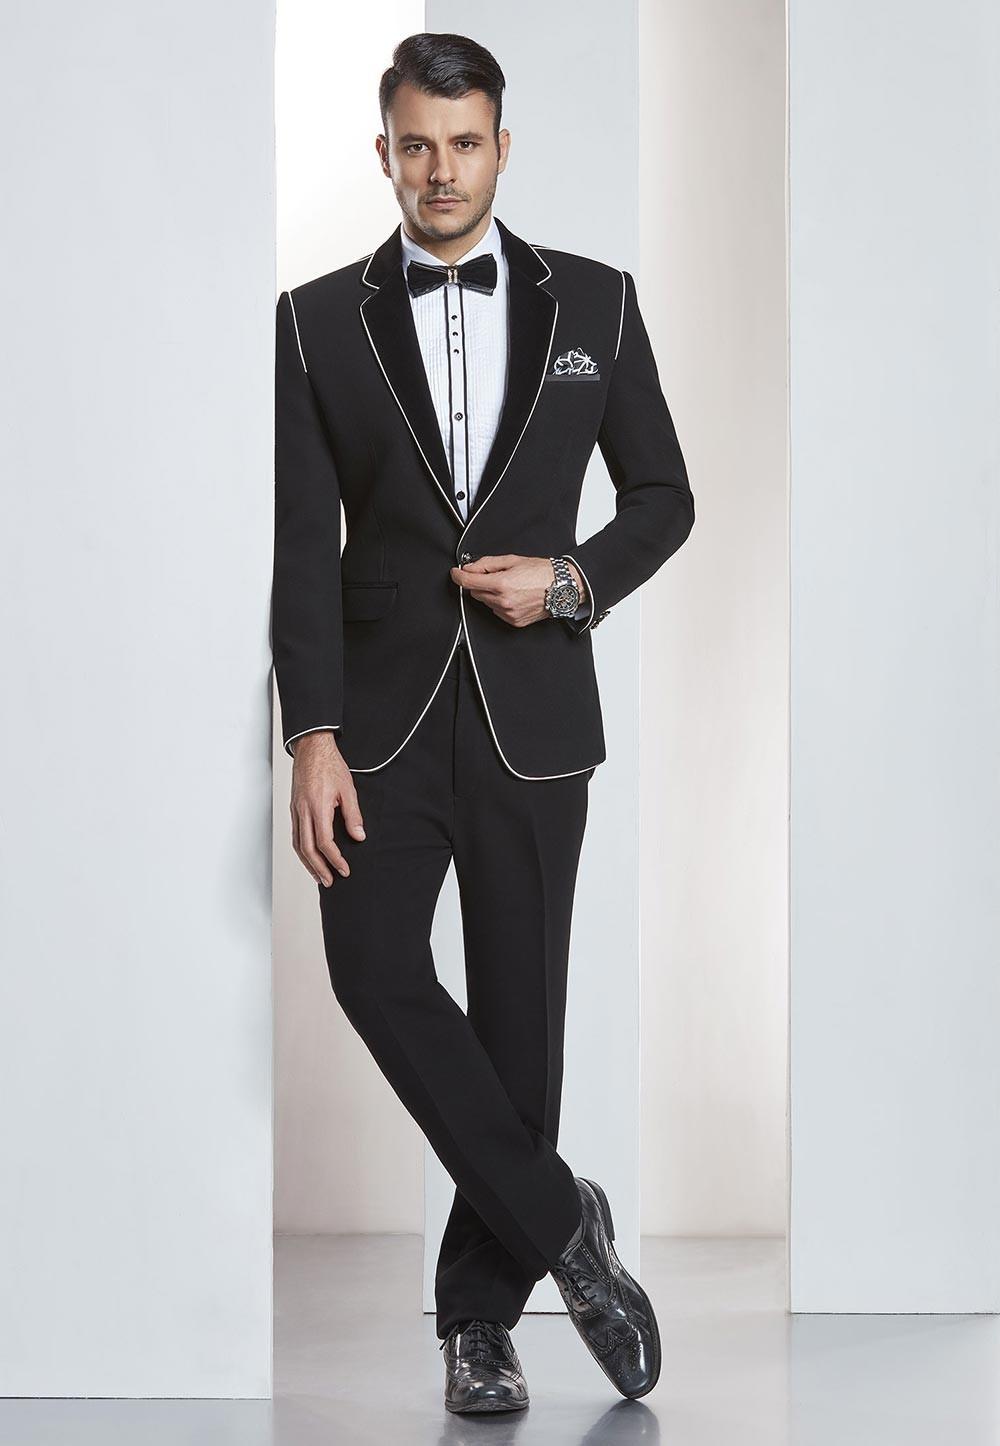 Designer Suits for Men Black Color Designer Tuxedo Suit